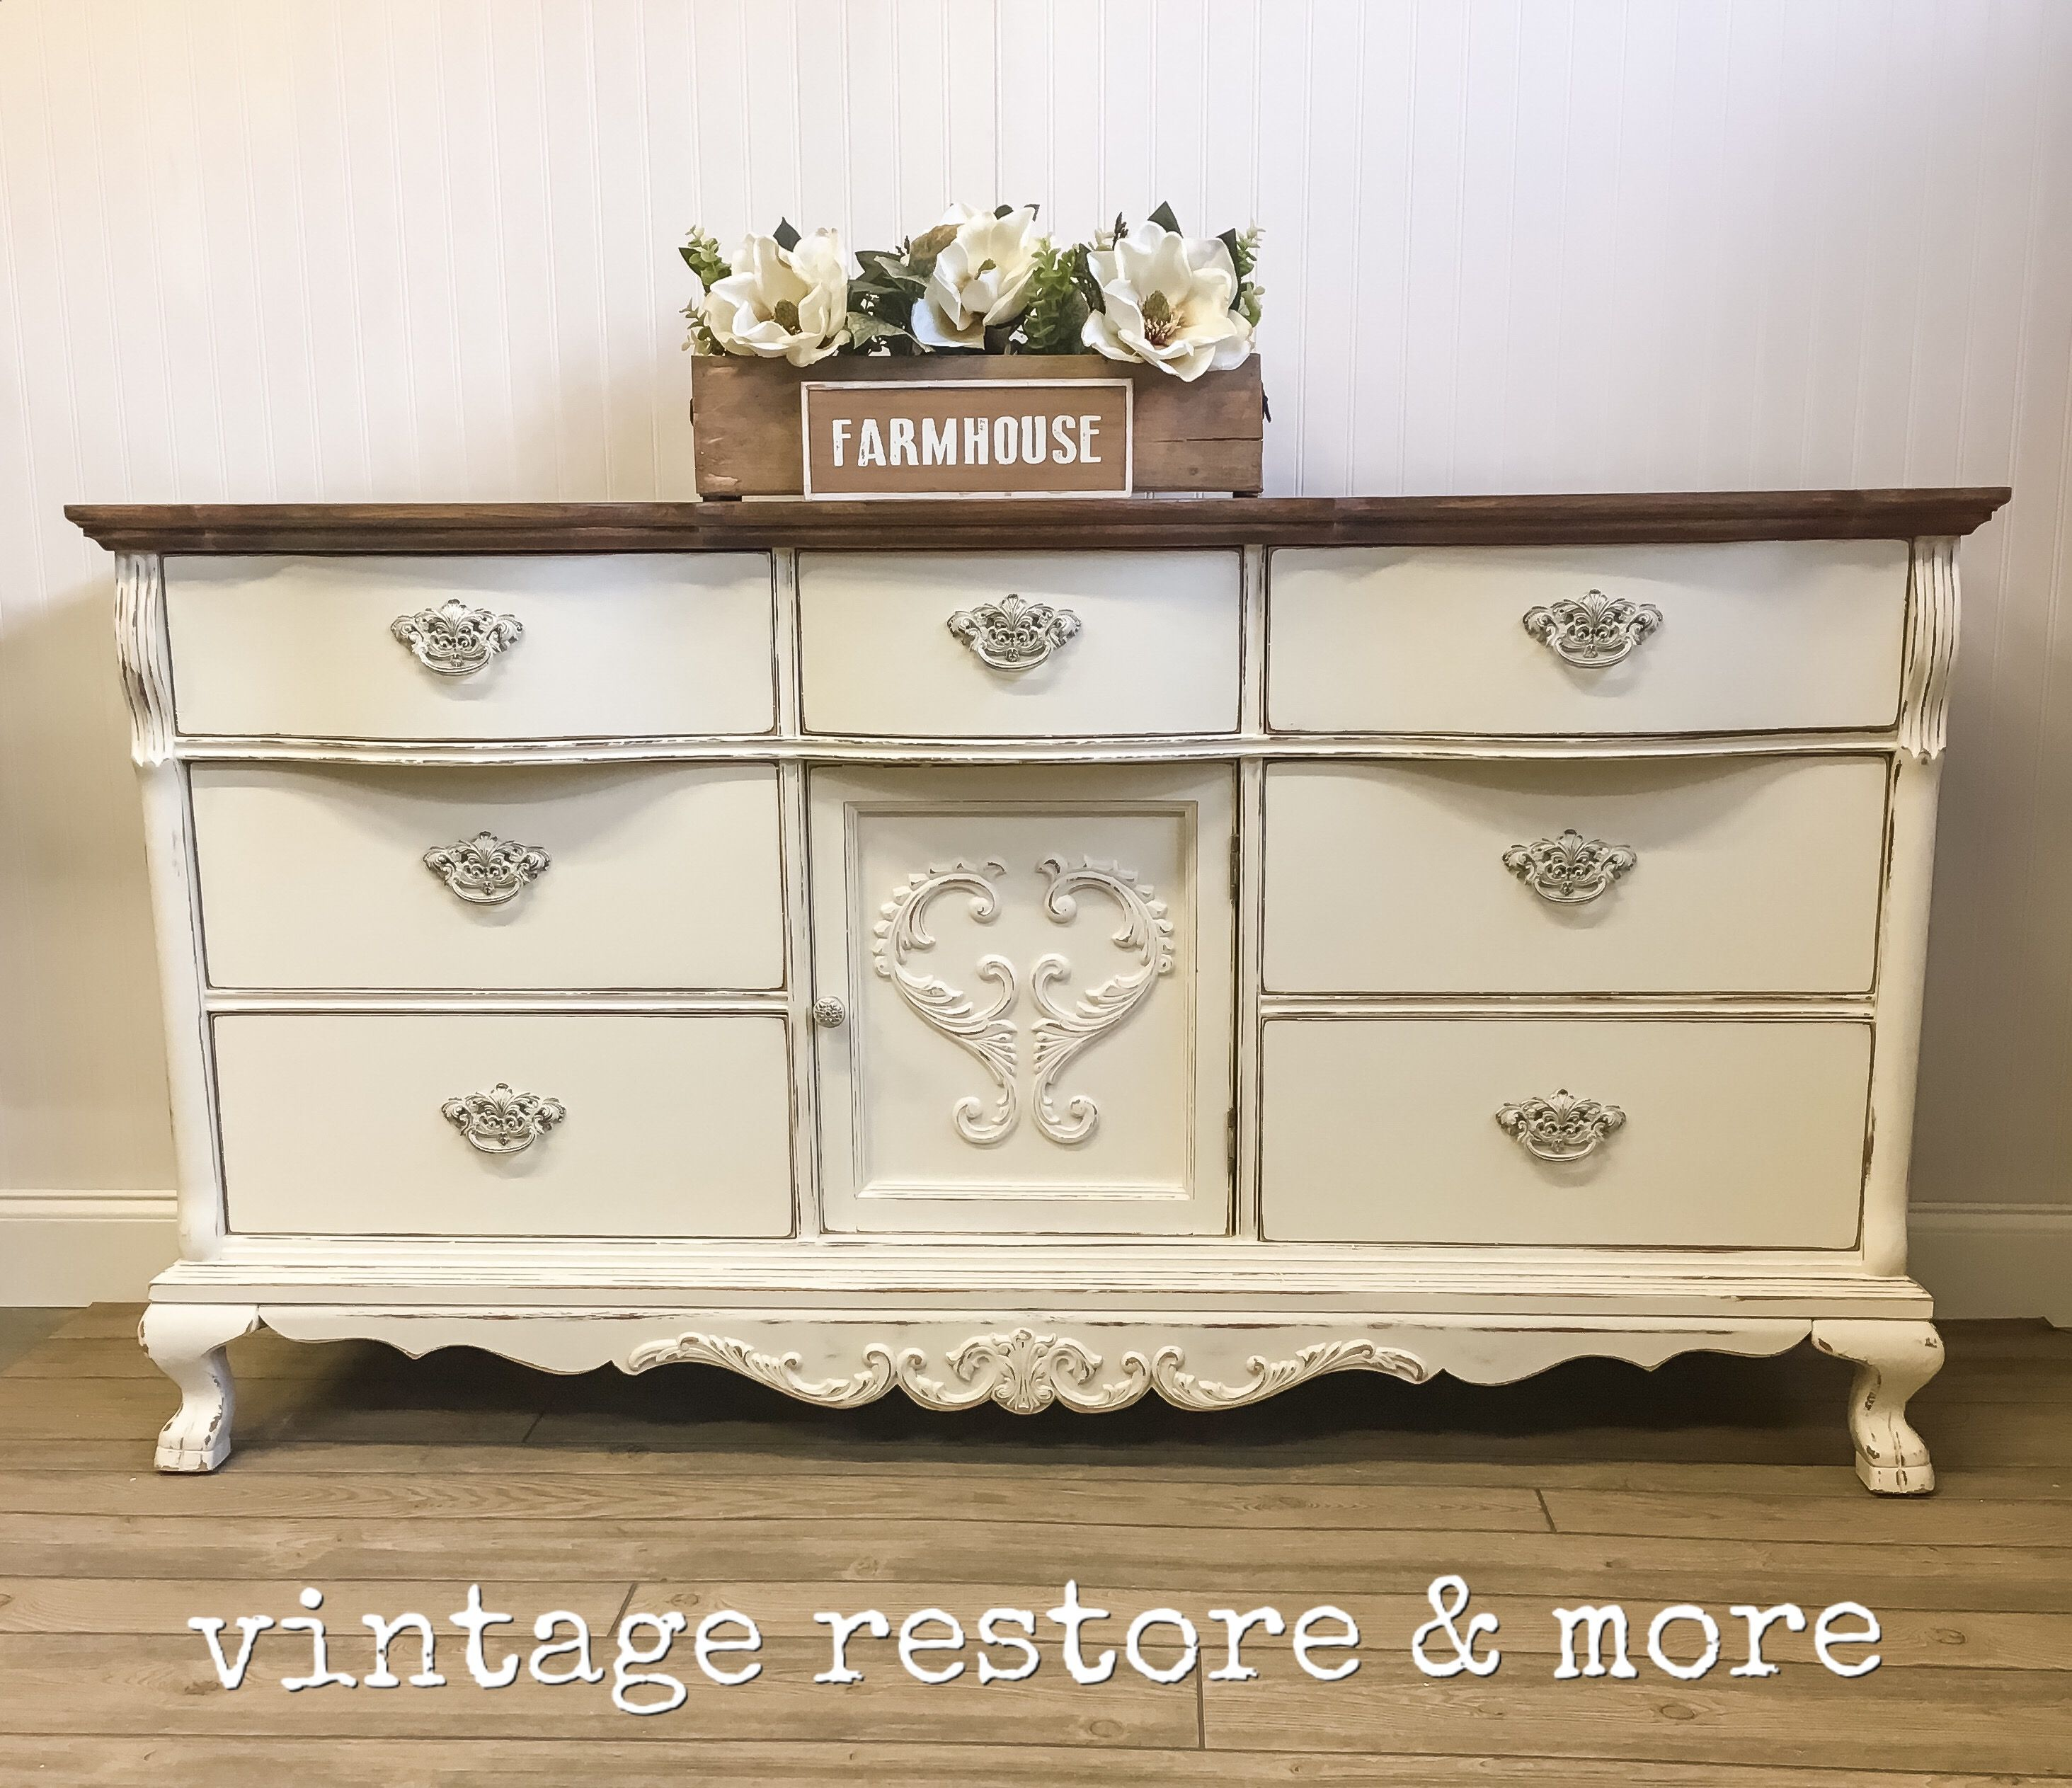 Lexington Victorian Sampler Lexington Furniture White Painted Furniture Furniture Projects